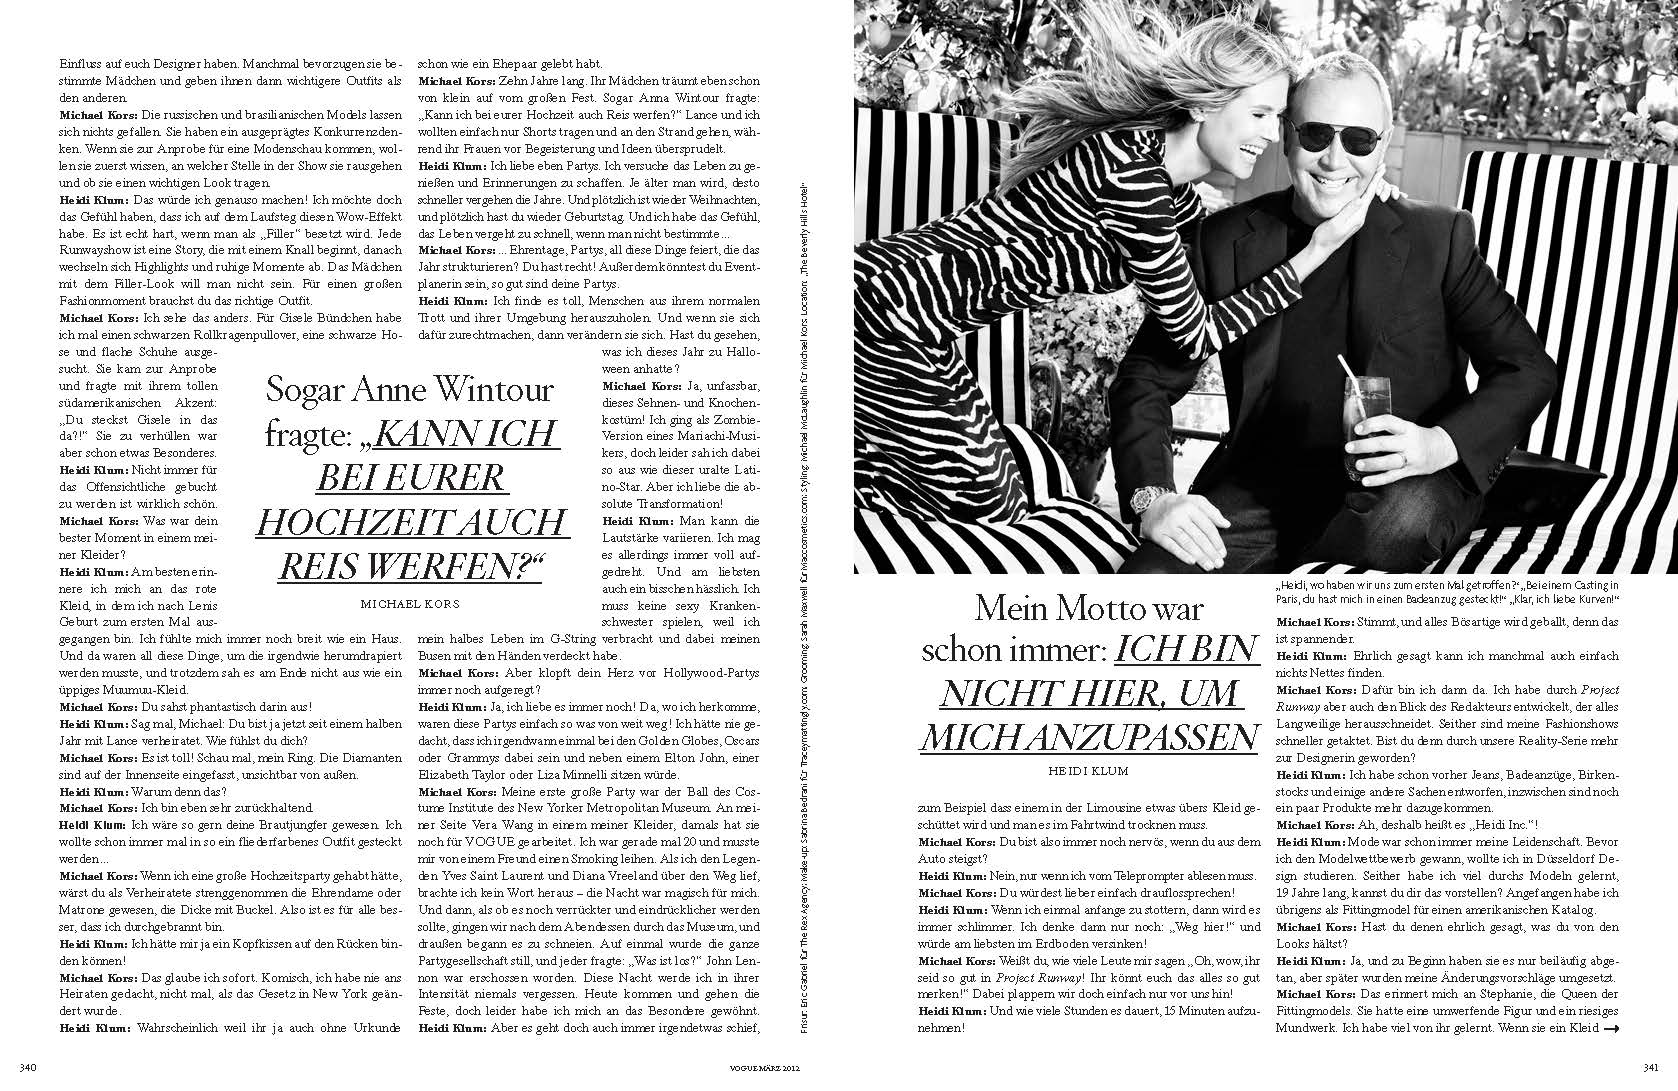 Heidi Klum + Michael Kors